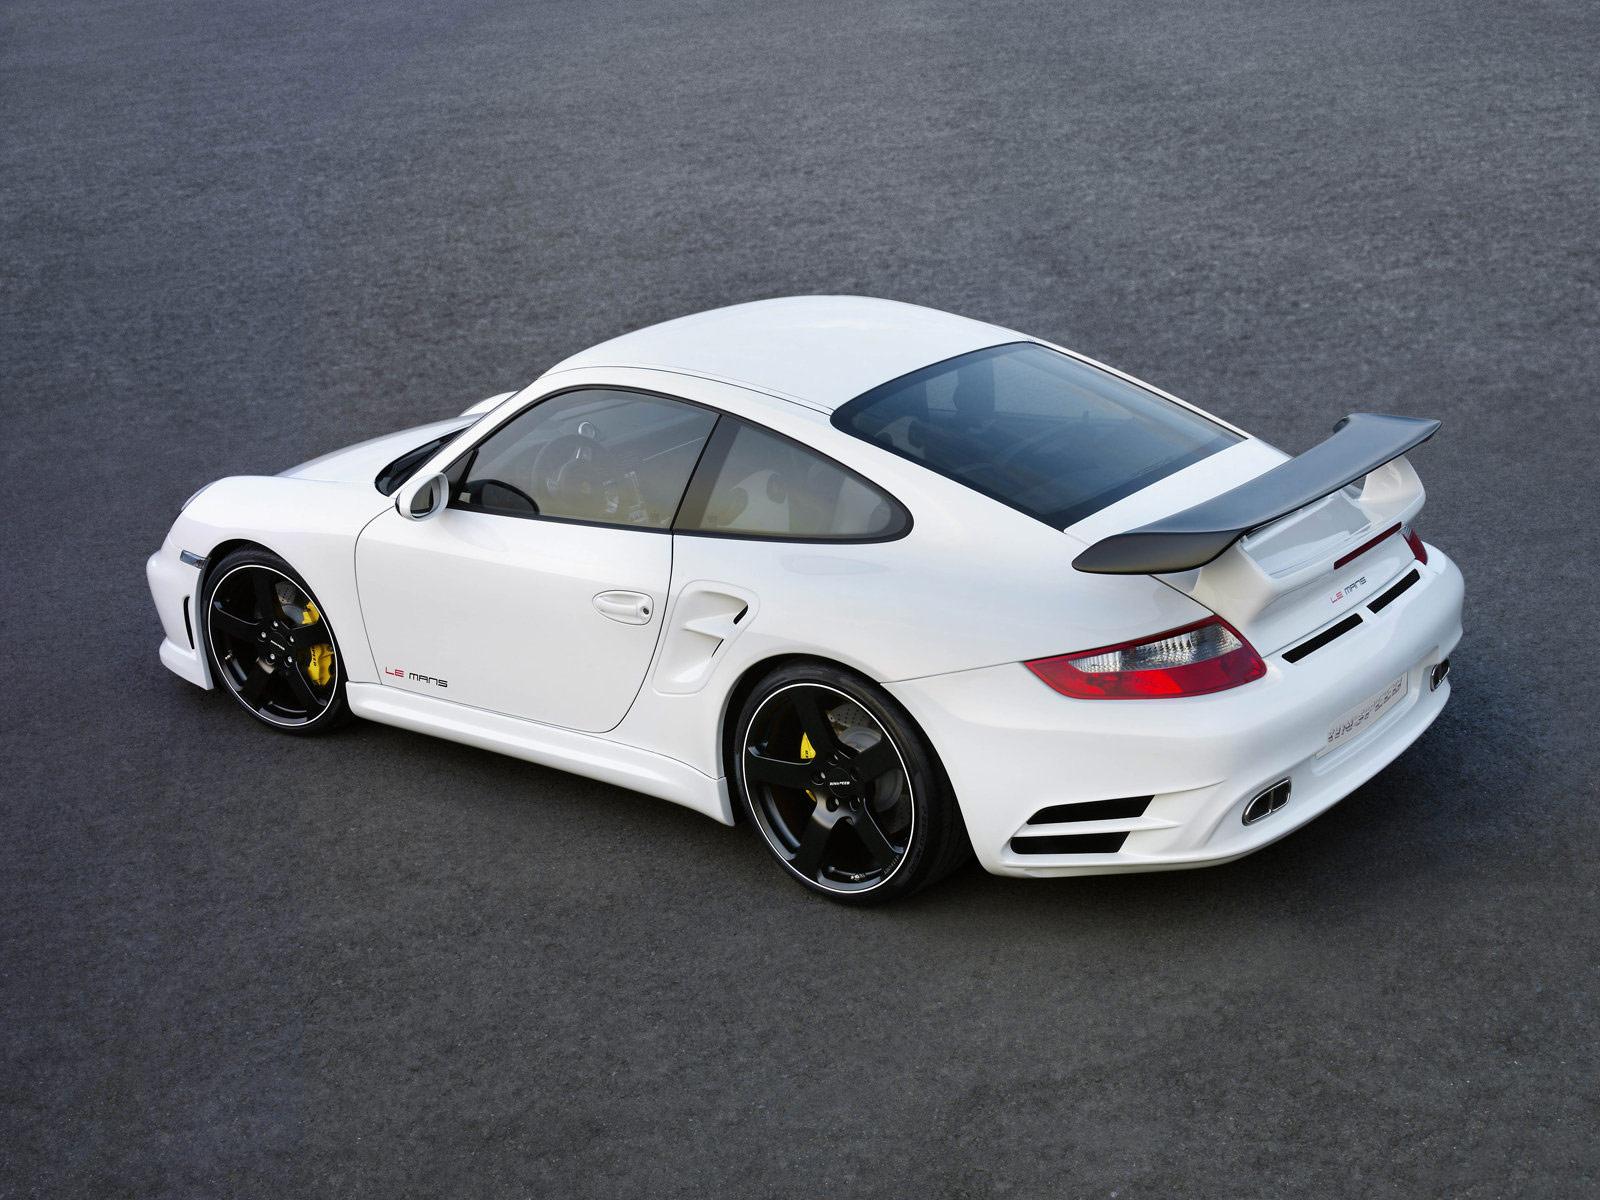 http://1.bp.blogspot.com/-2zNGsyroAeY/TtS9mYDBQiI/AAAAAAAAFAM/YgJbHa0zGPM/s1600/2007_Rinspeed-Porsche-997-Turbo-Le-Mans-600_pictures_5.jpg